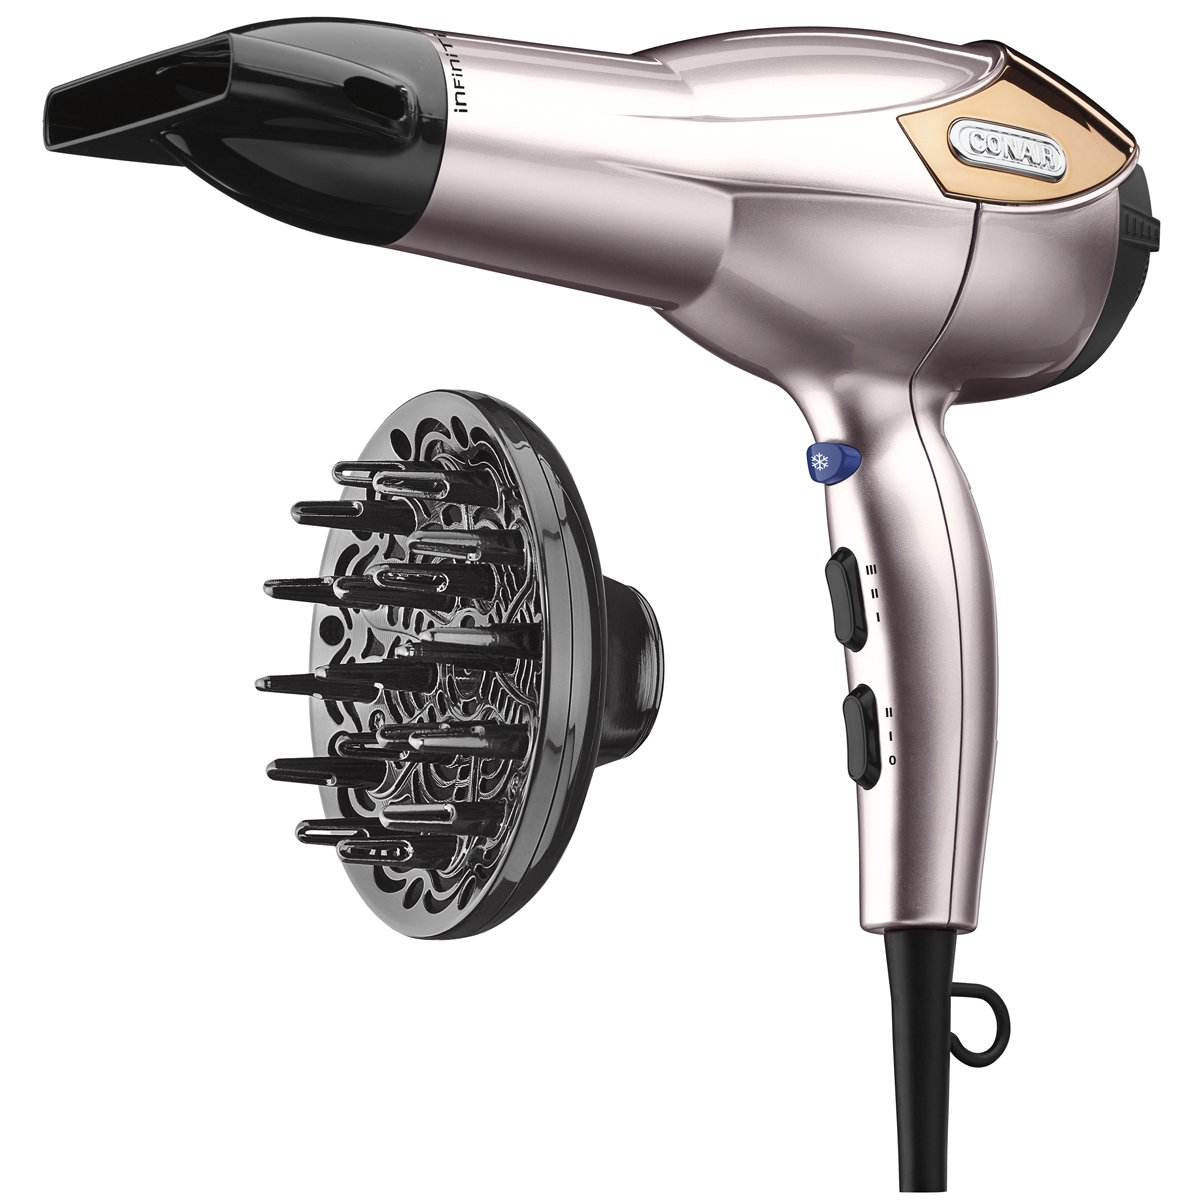 Conair Infinitipro 584 salon performance lightweight ac motor, 1 Count Conair Consumer Products ULC